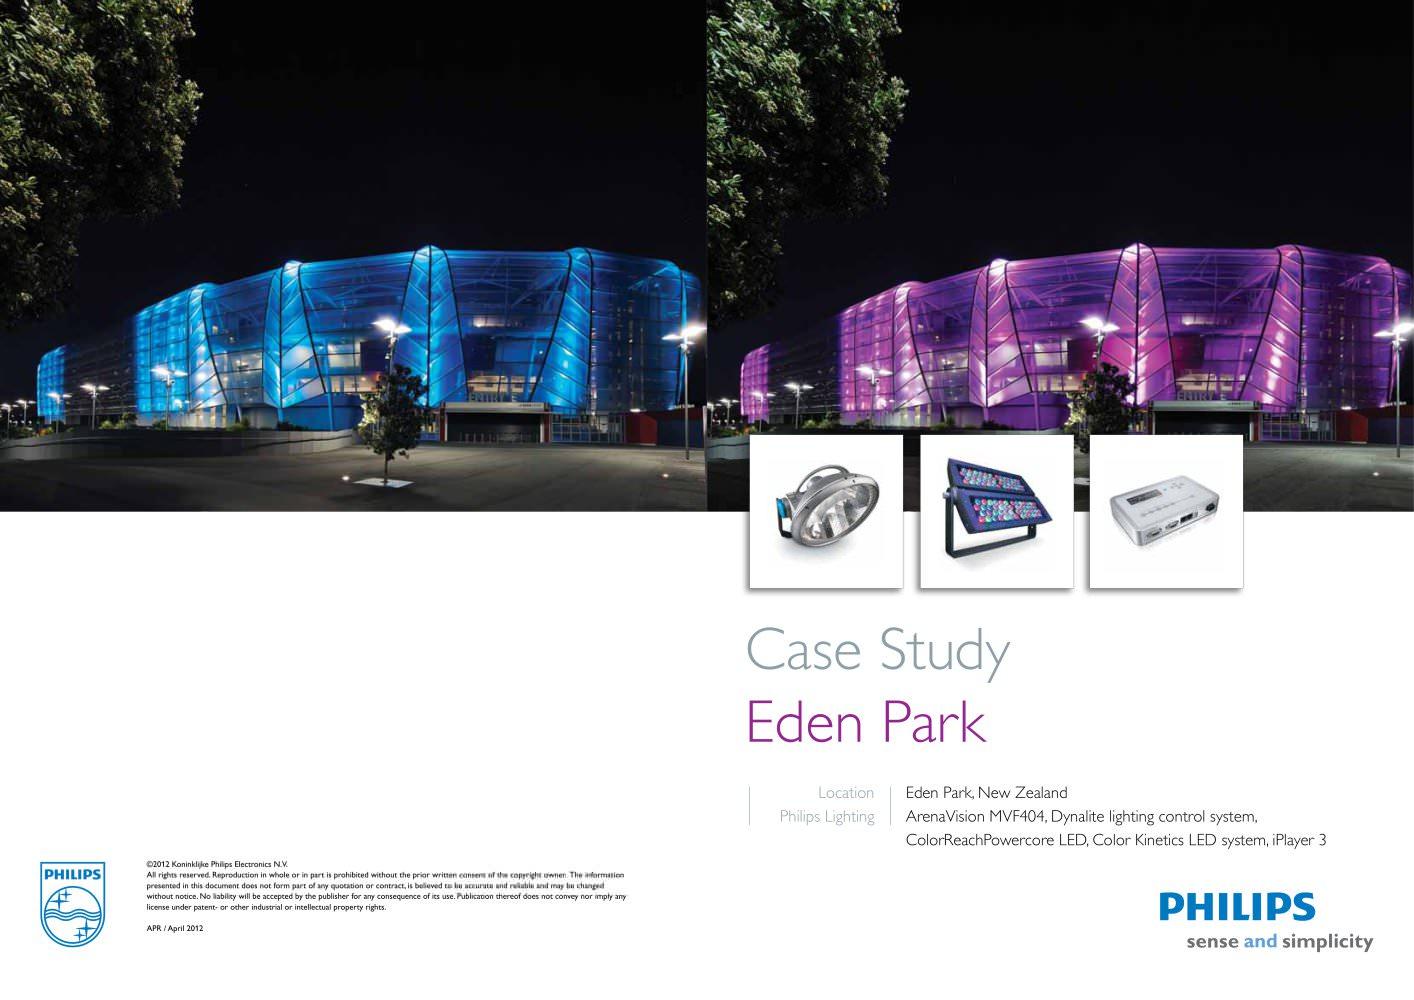 Philips lighting lamps catalogue meganraley case study eden park philips lighting pdf catalogues arubaitofo Gallery